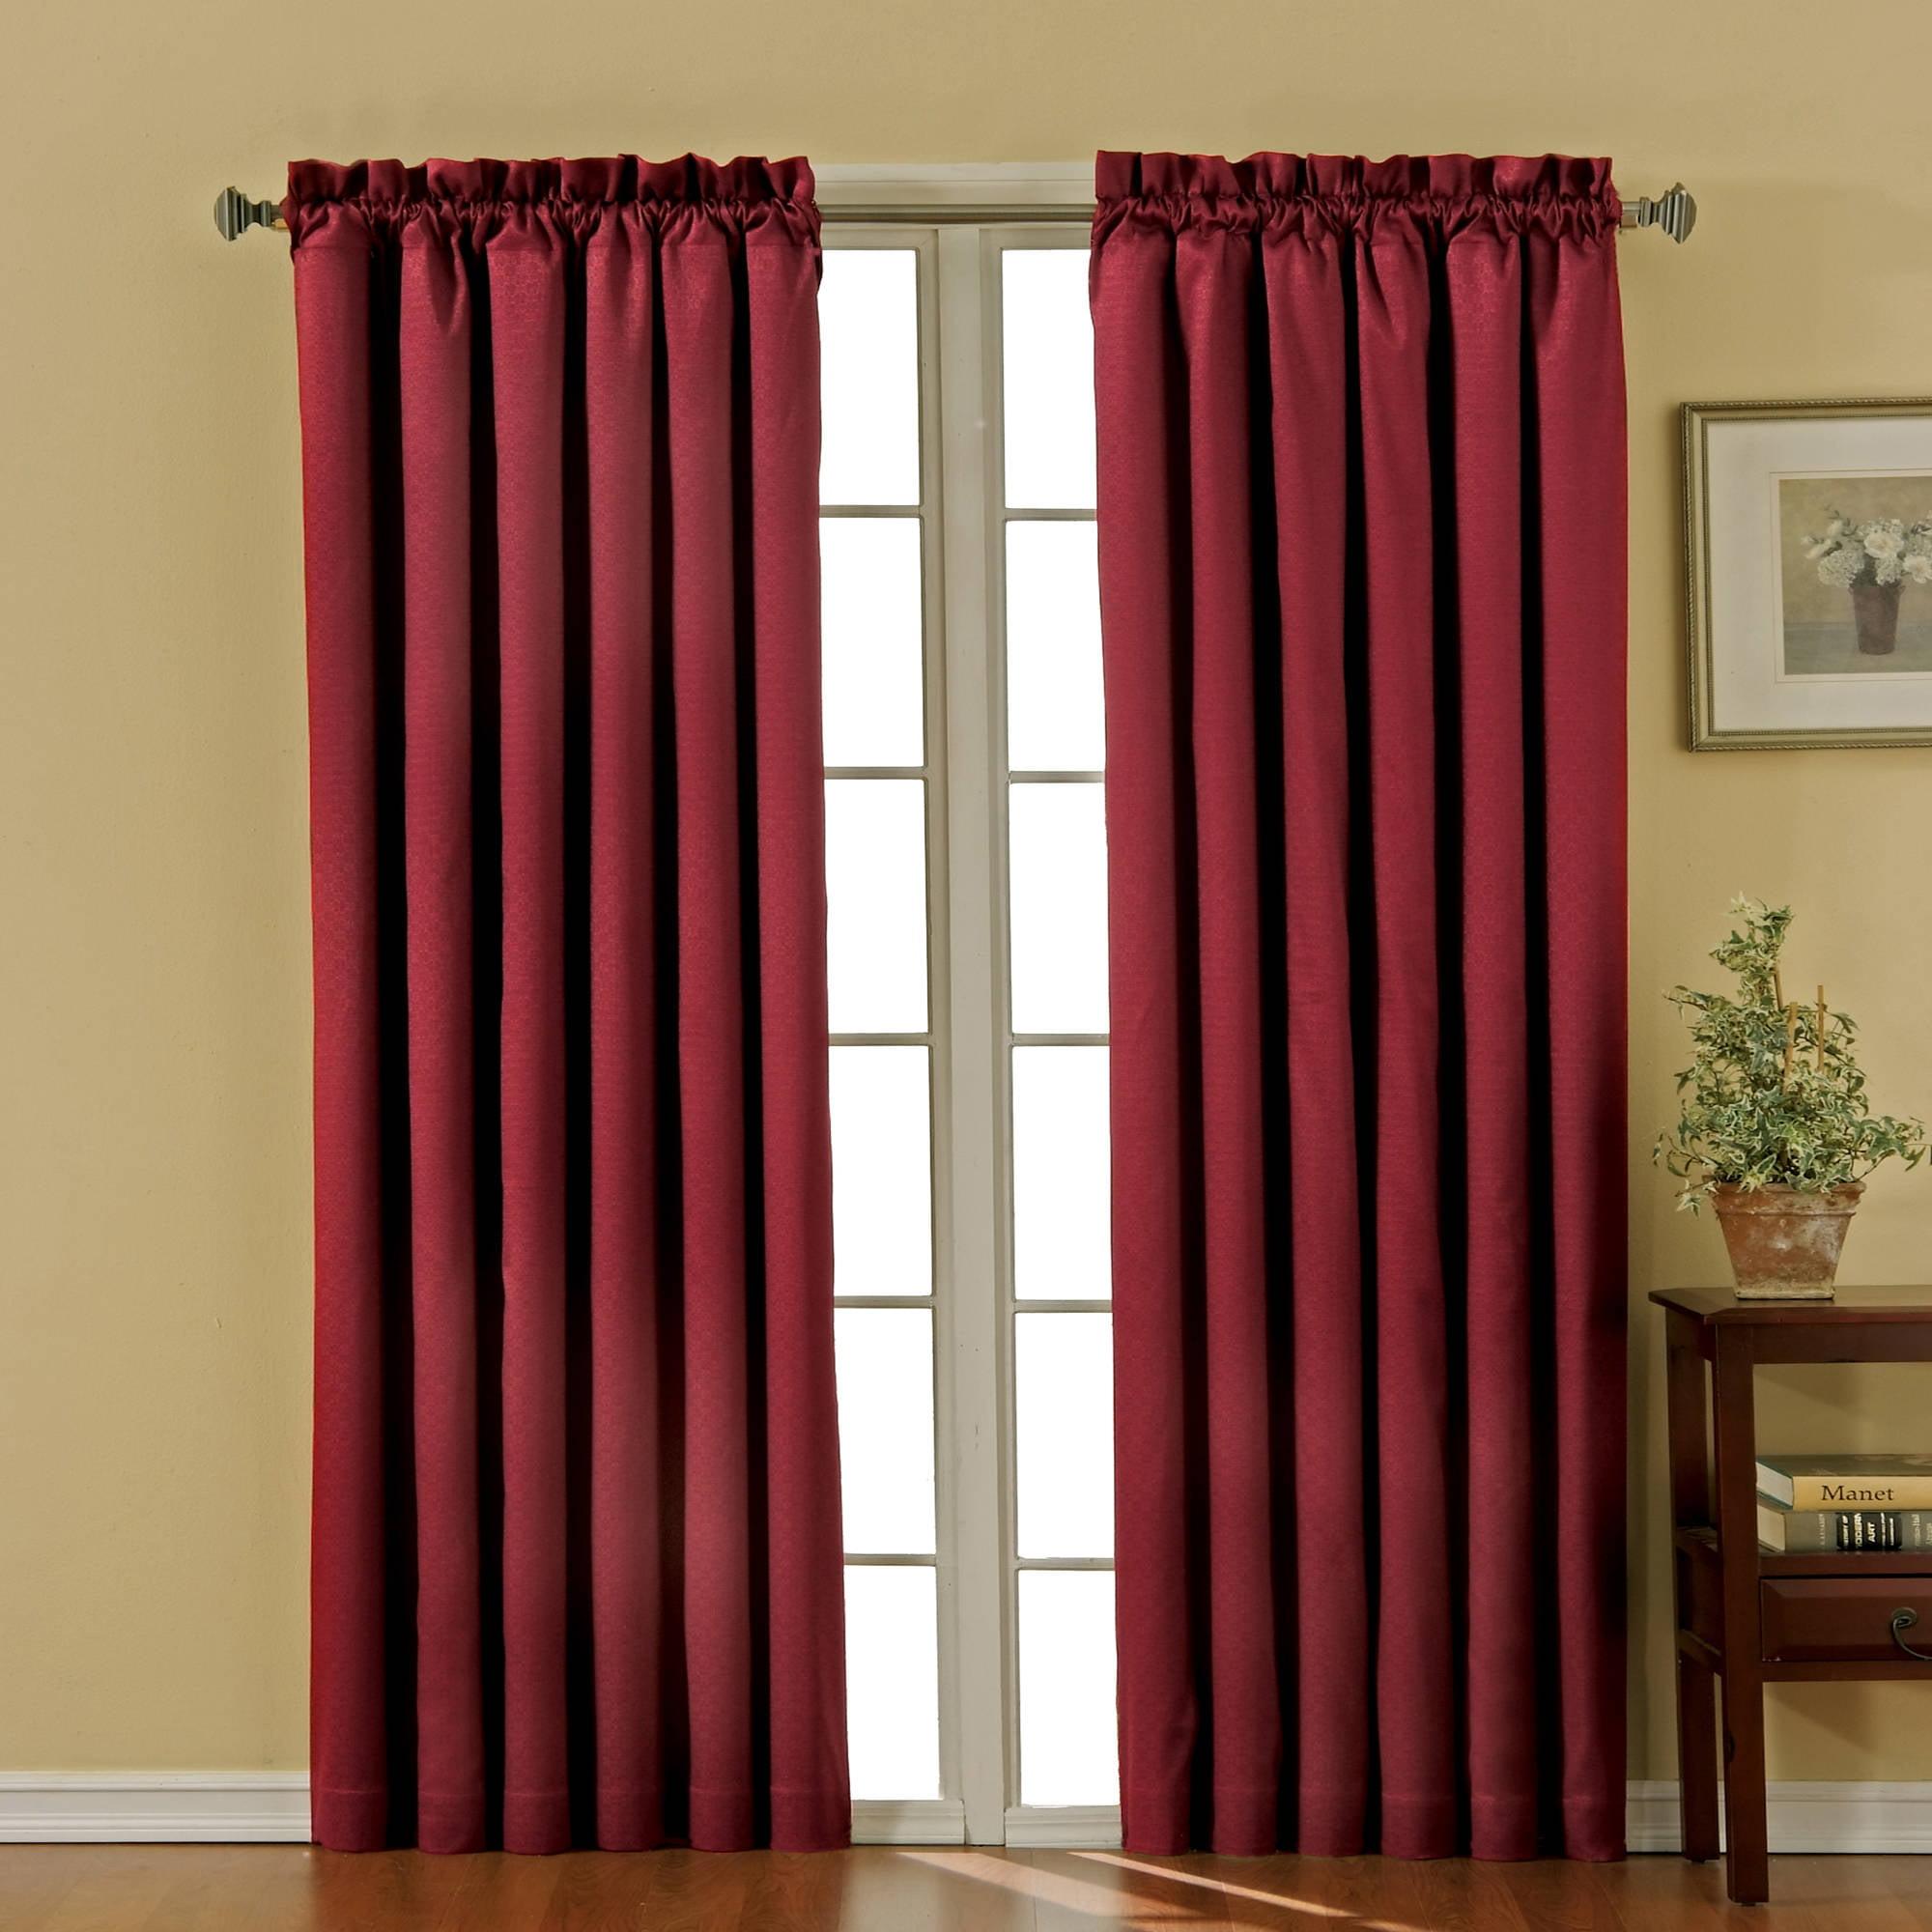 eclipse nottingham thermal energy-efficient grommet curtain panel